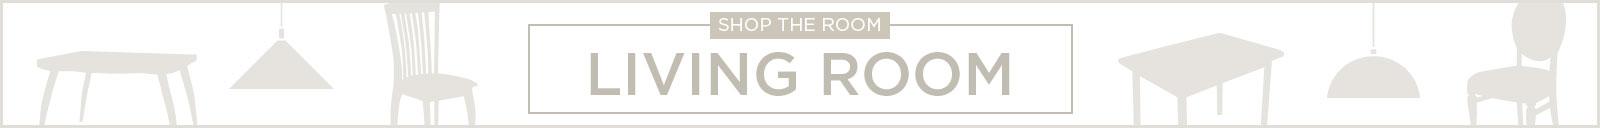 Shop Living Room Ideas